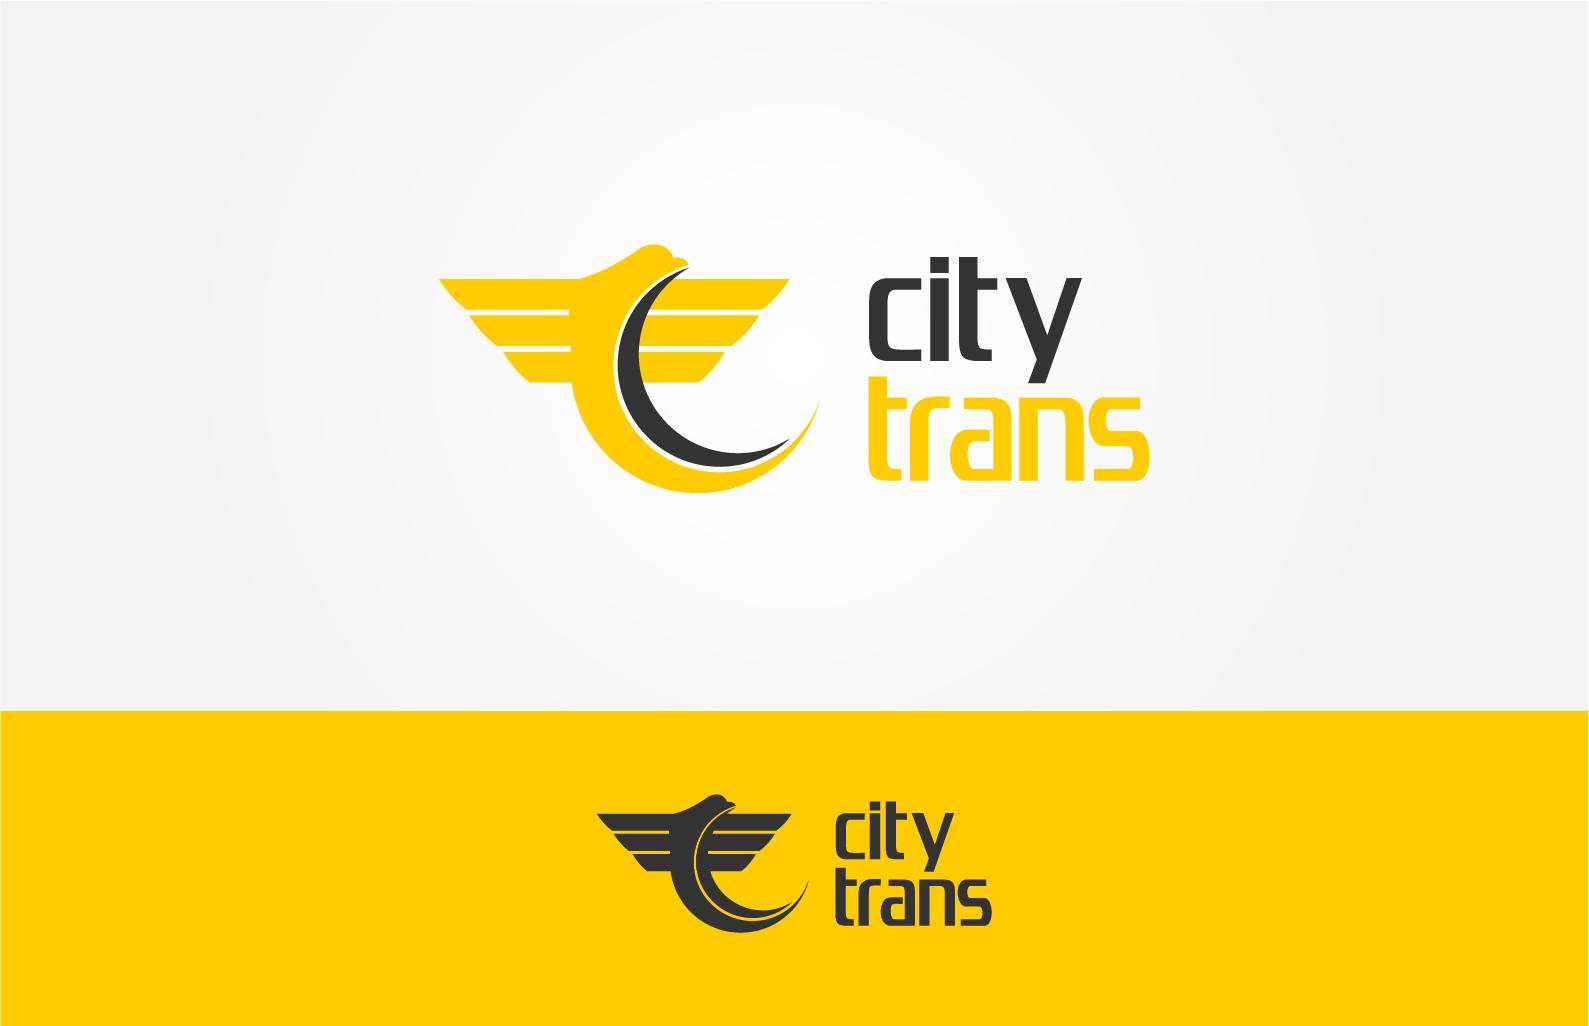 Разработка Логотипа транспортной компании фото f_9105e6dfbc08caf1.jpg